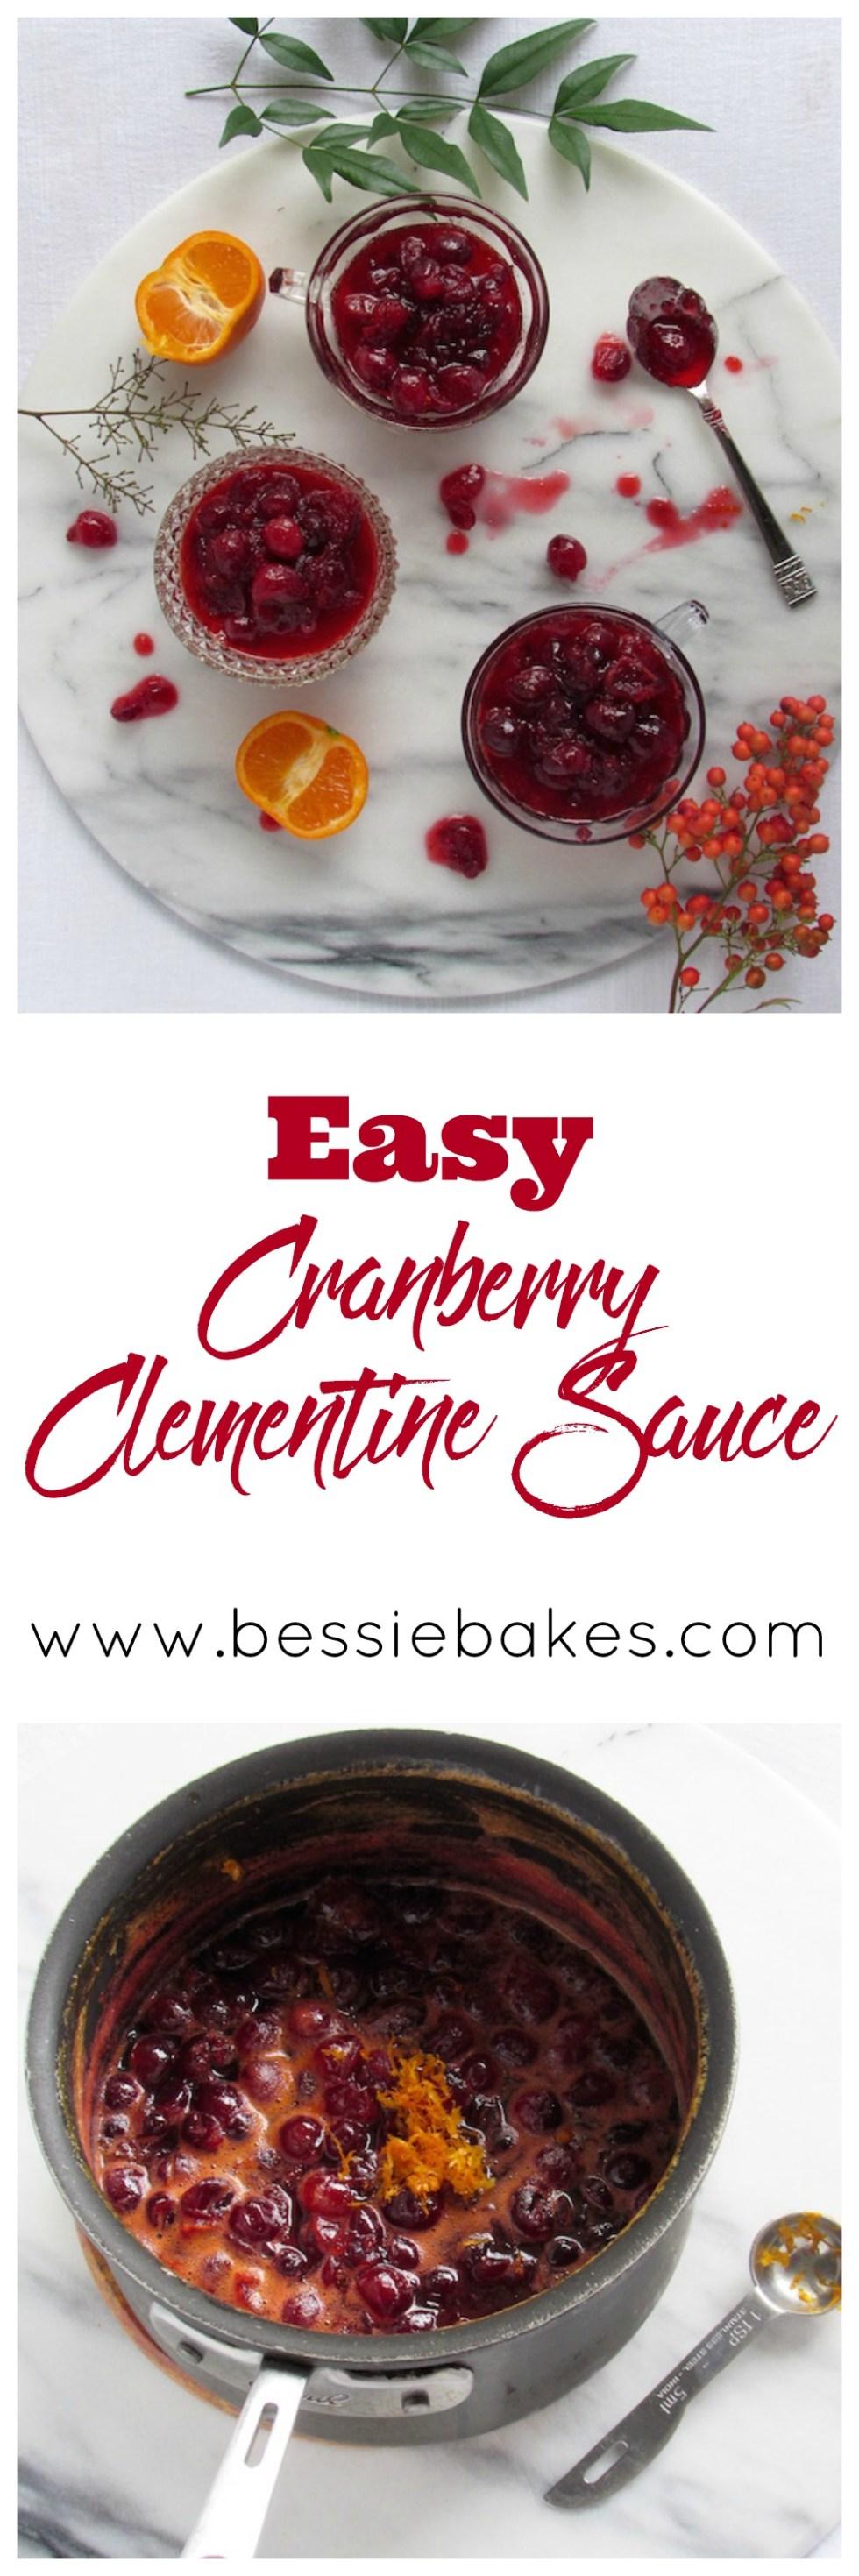 Cranberry Clementine Sauce Pinterest